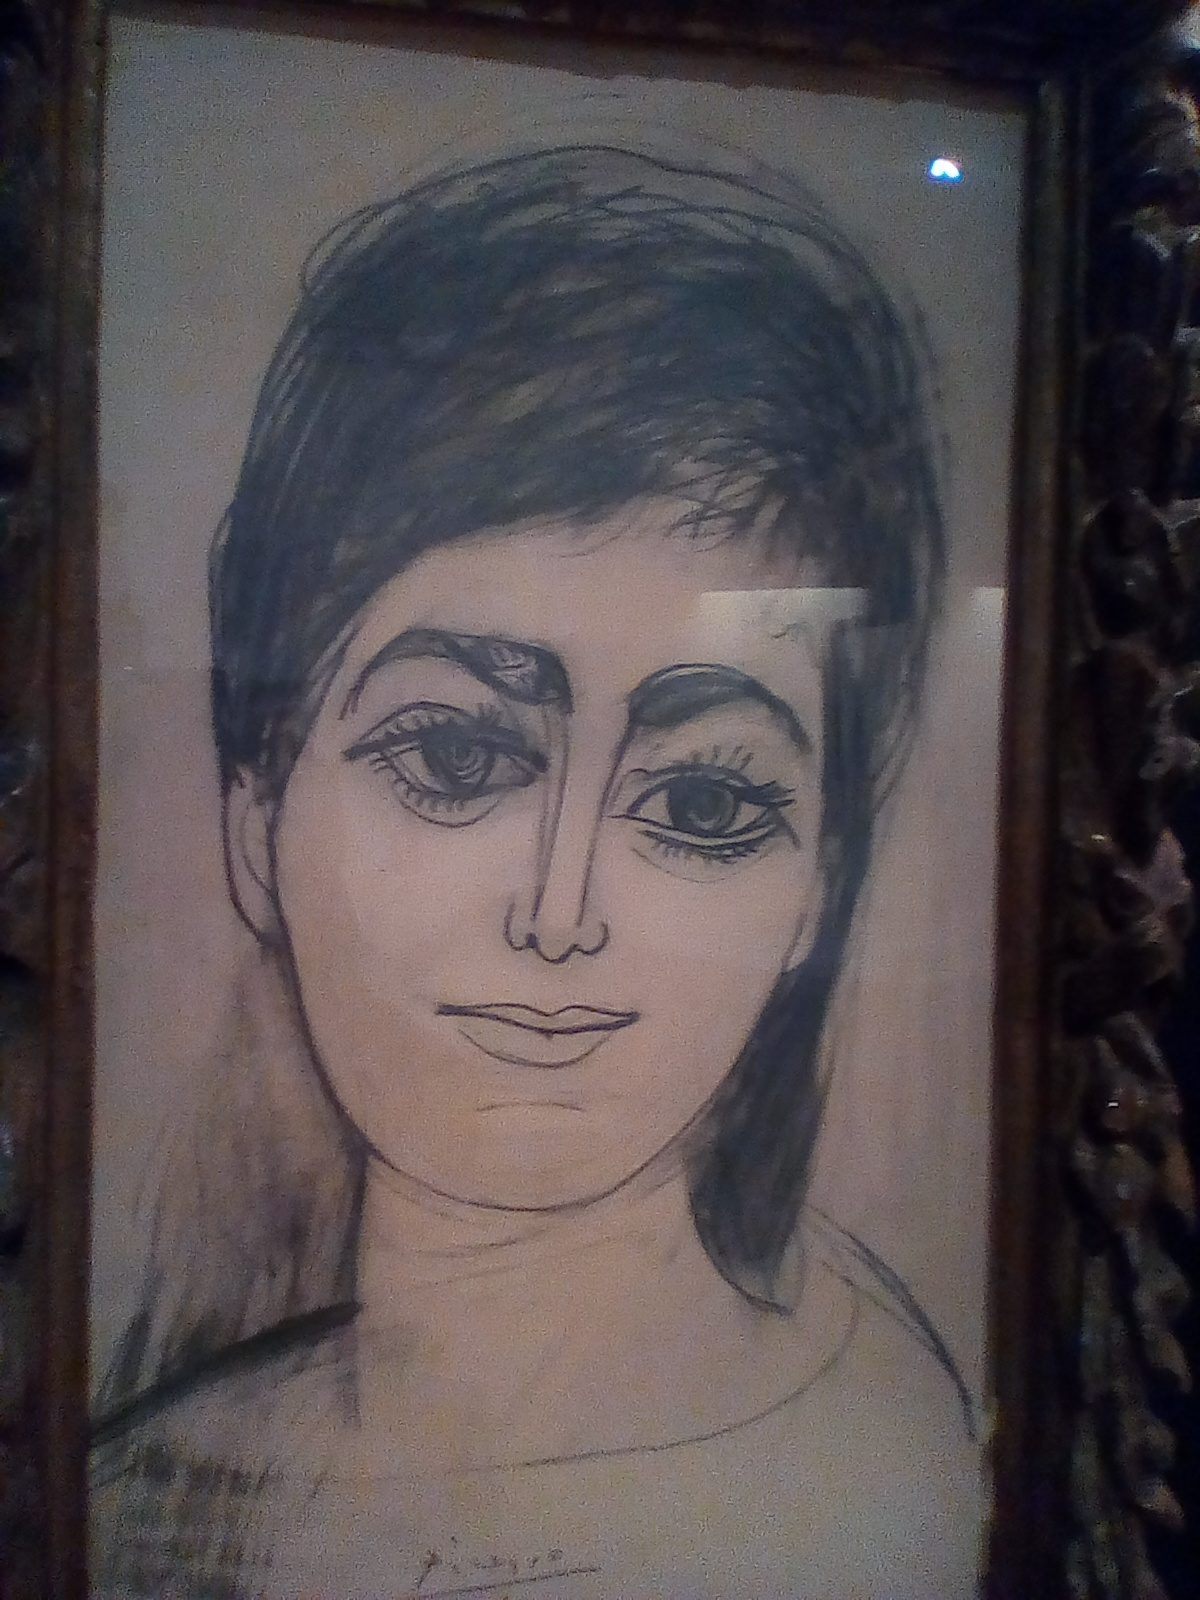 Picasso.μονοφθαλμος βασιλιας τυφλων υποστηριξε αλγερινη βομβίστρια